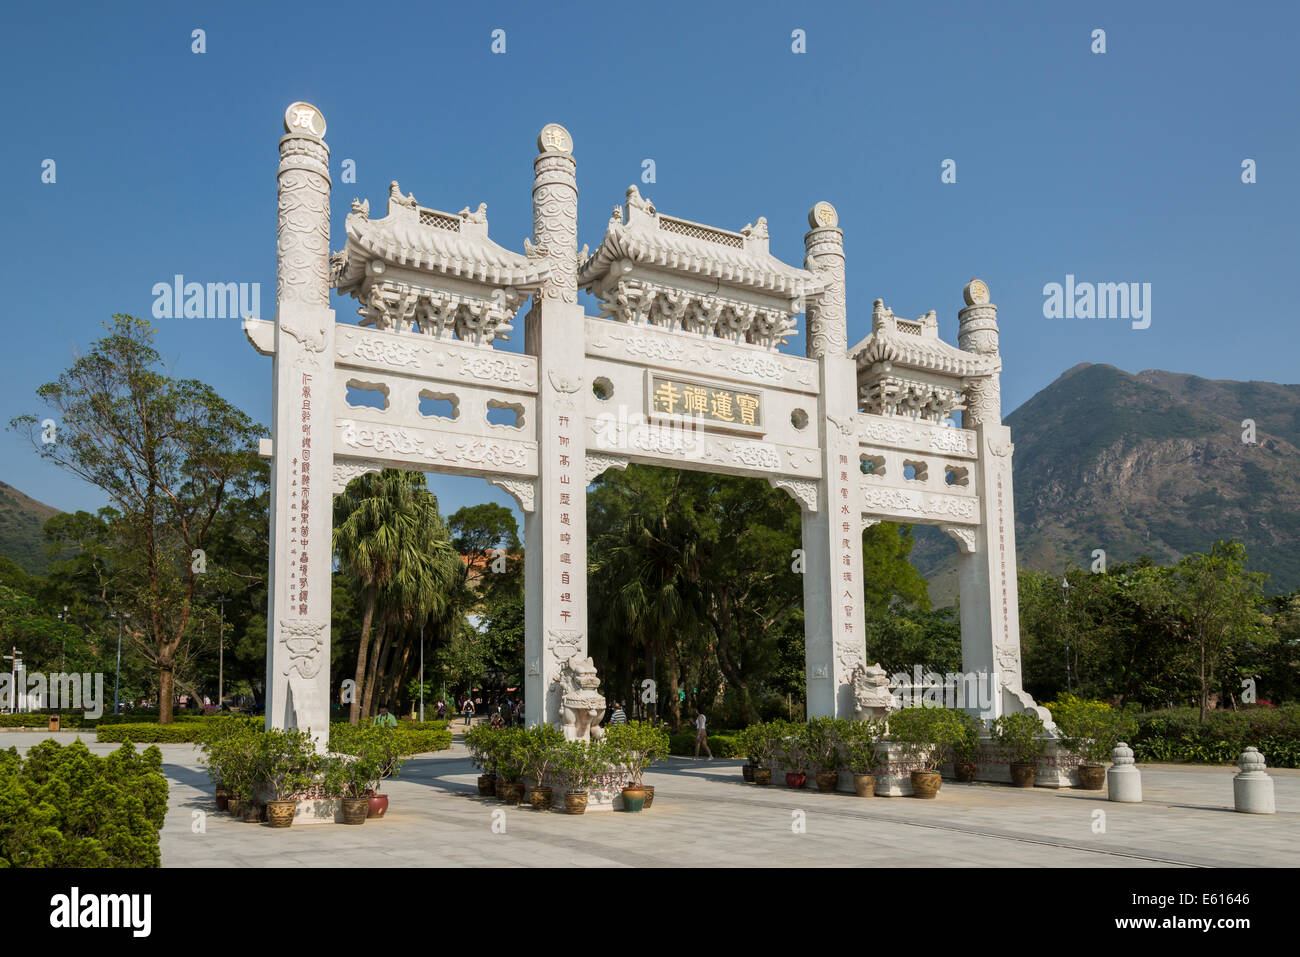 Portal, Po Lin Monastery, Lantau Island, Hong Kong, China - Stock Image